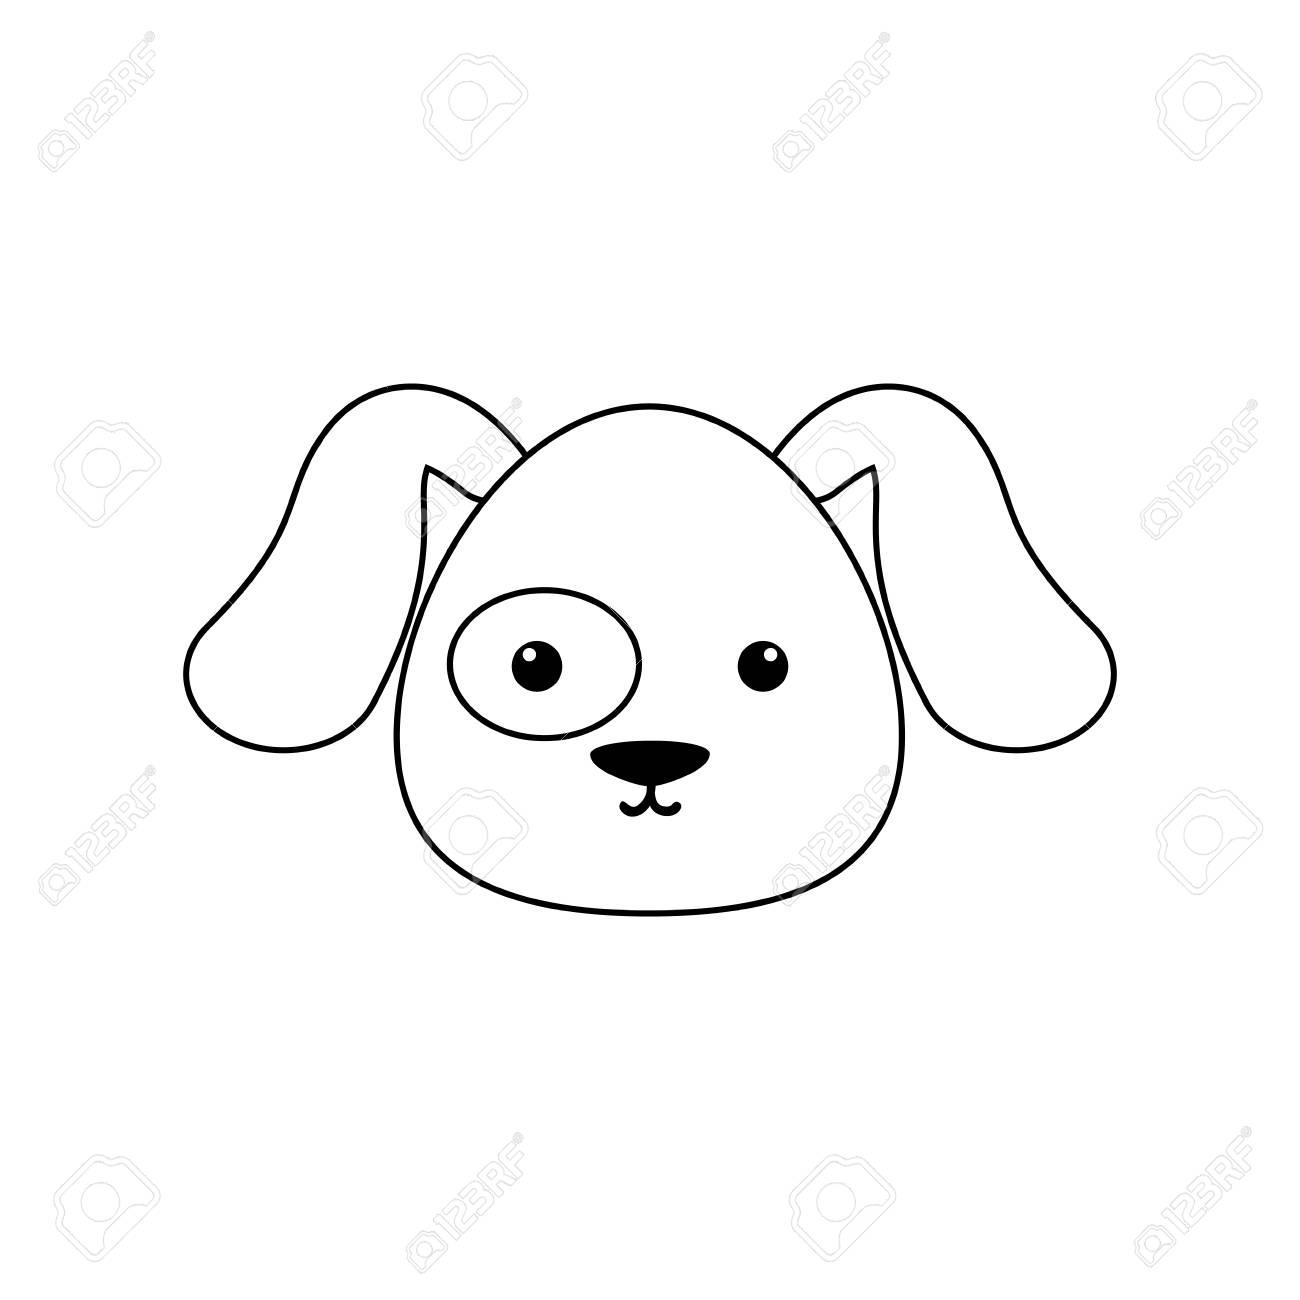 dog drawing face royalty free cliparts vectors and stock